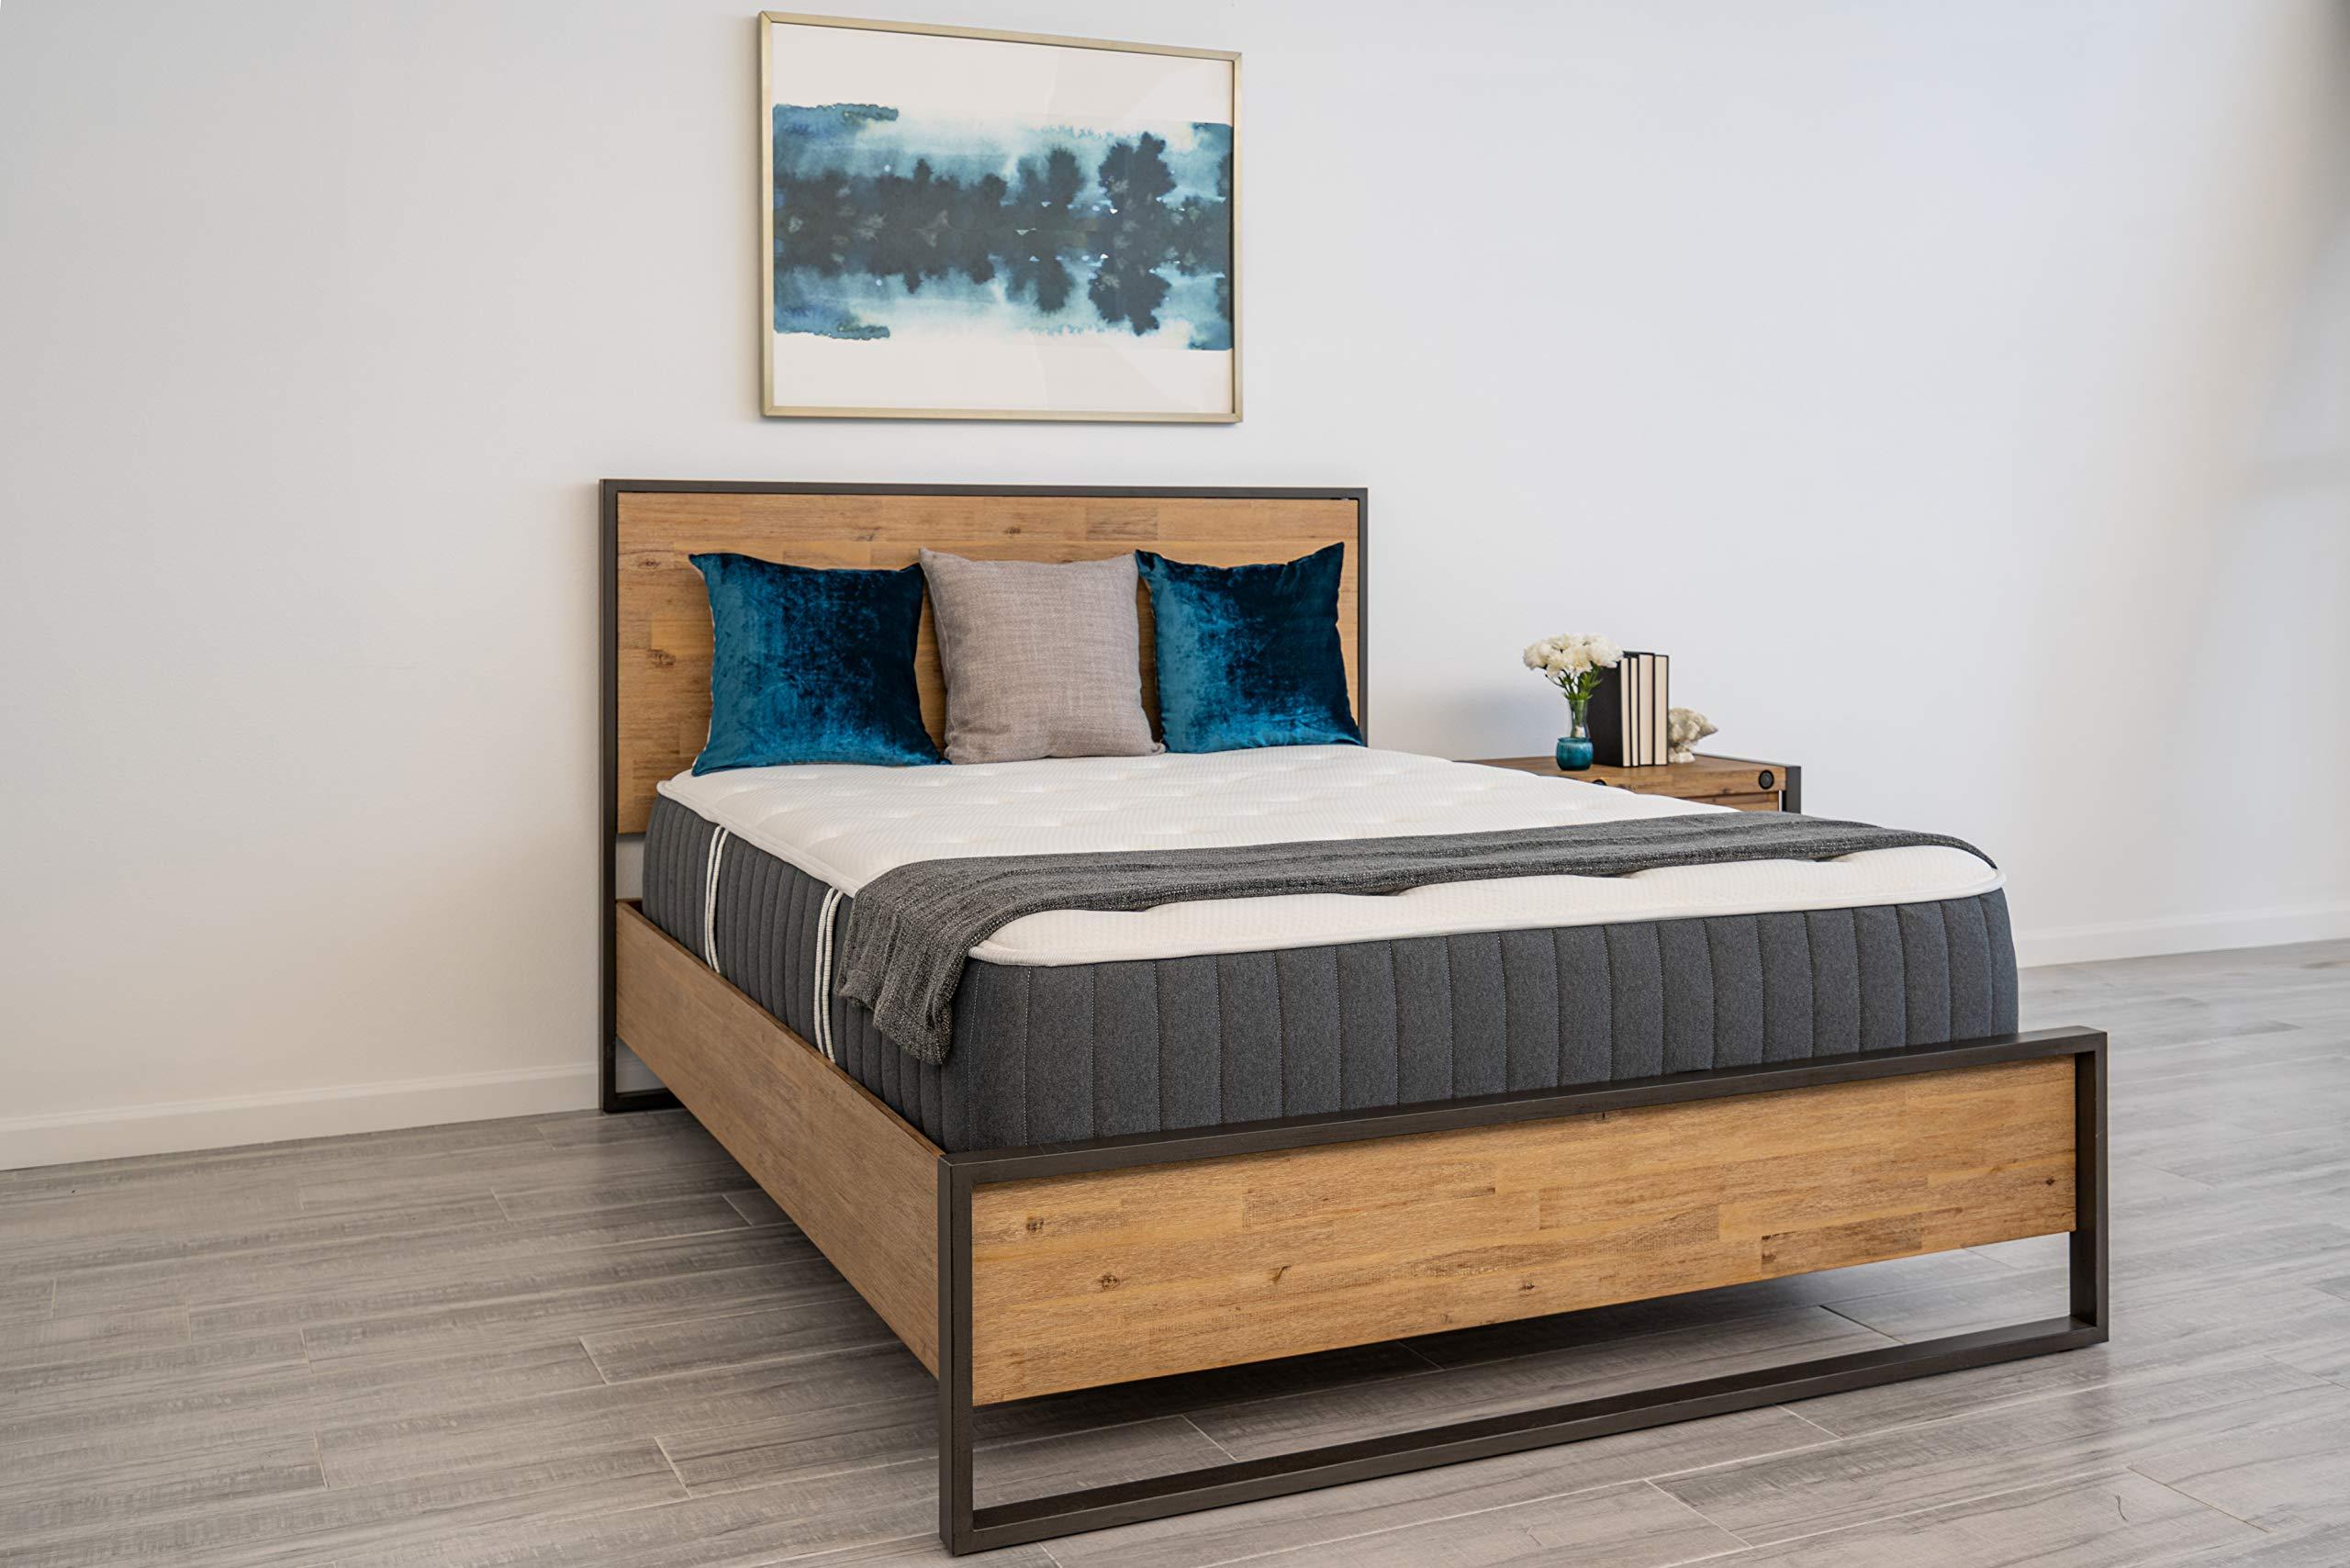 Dreamfoam Bedding Cooling Hybrid Mattress